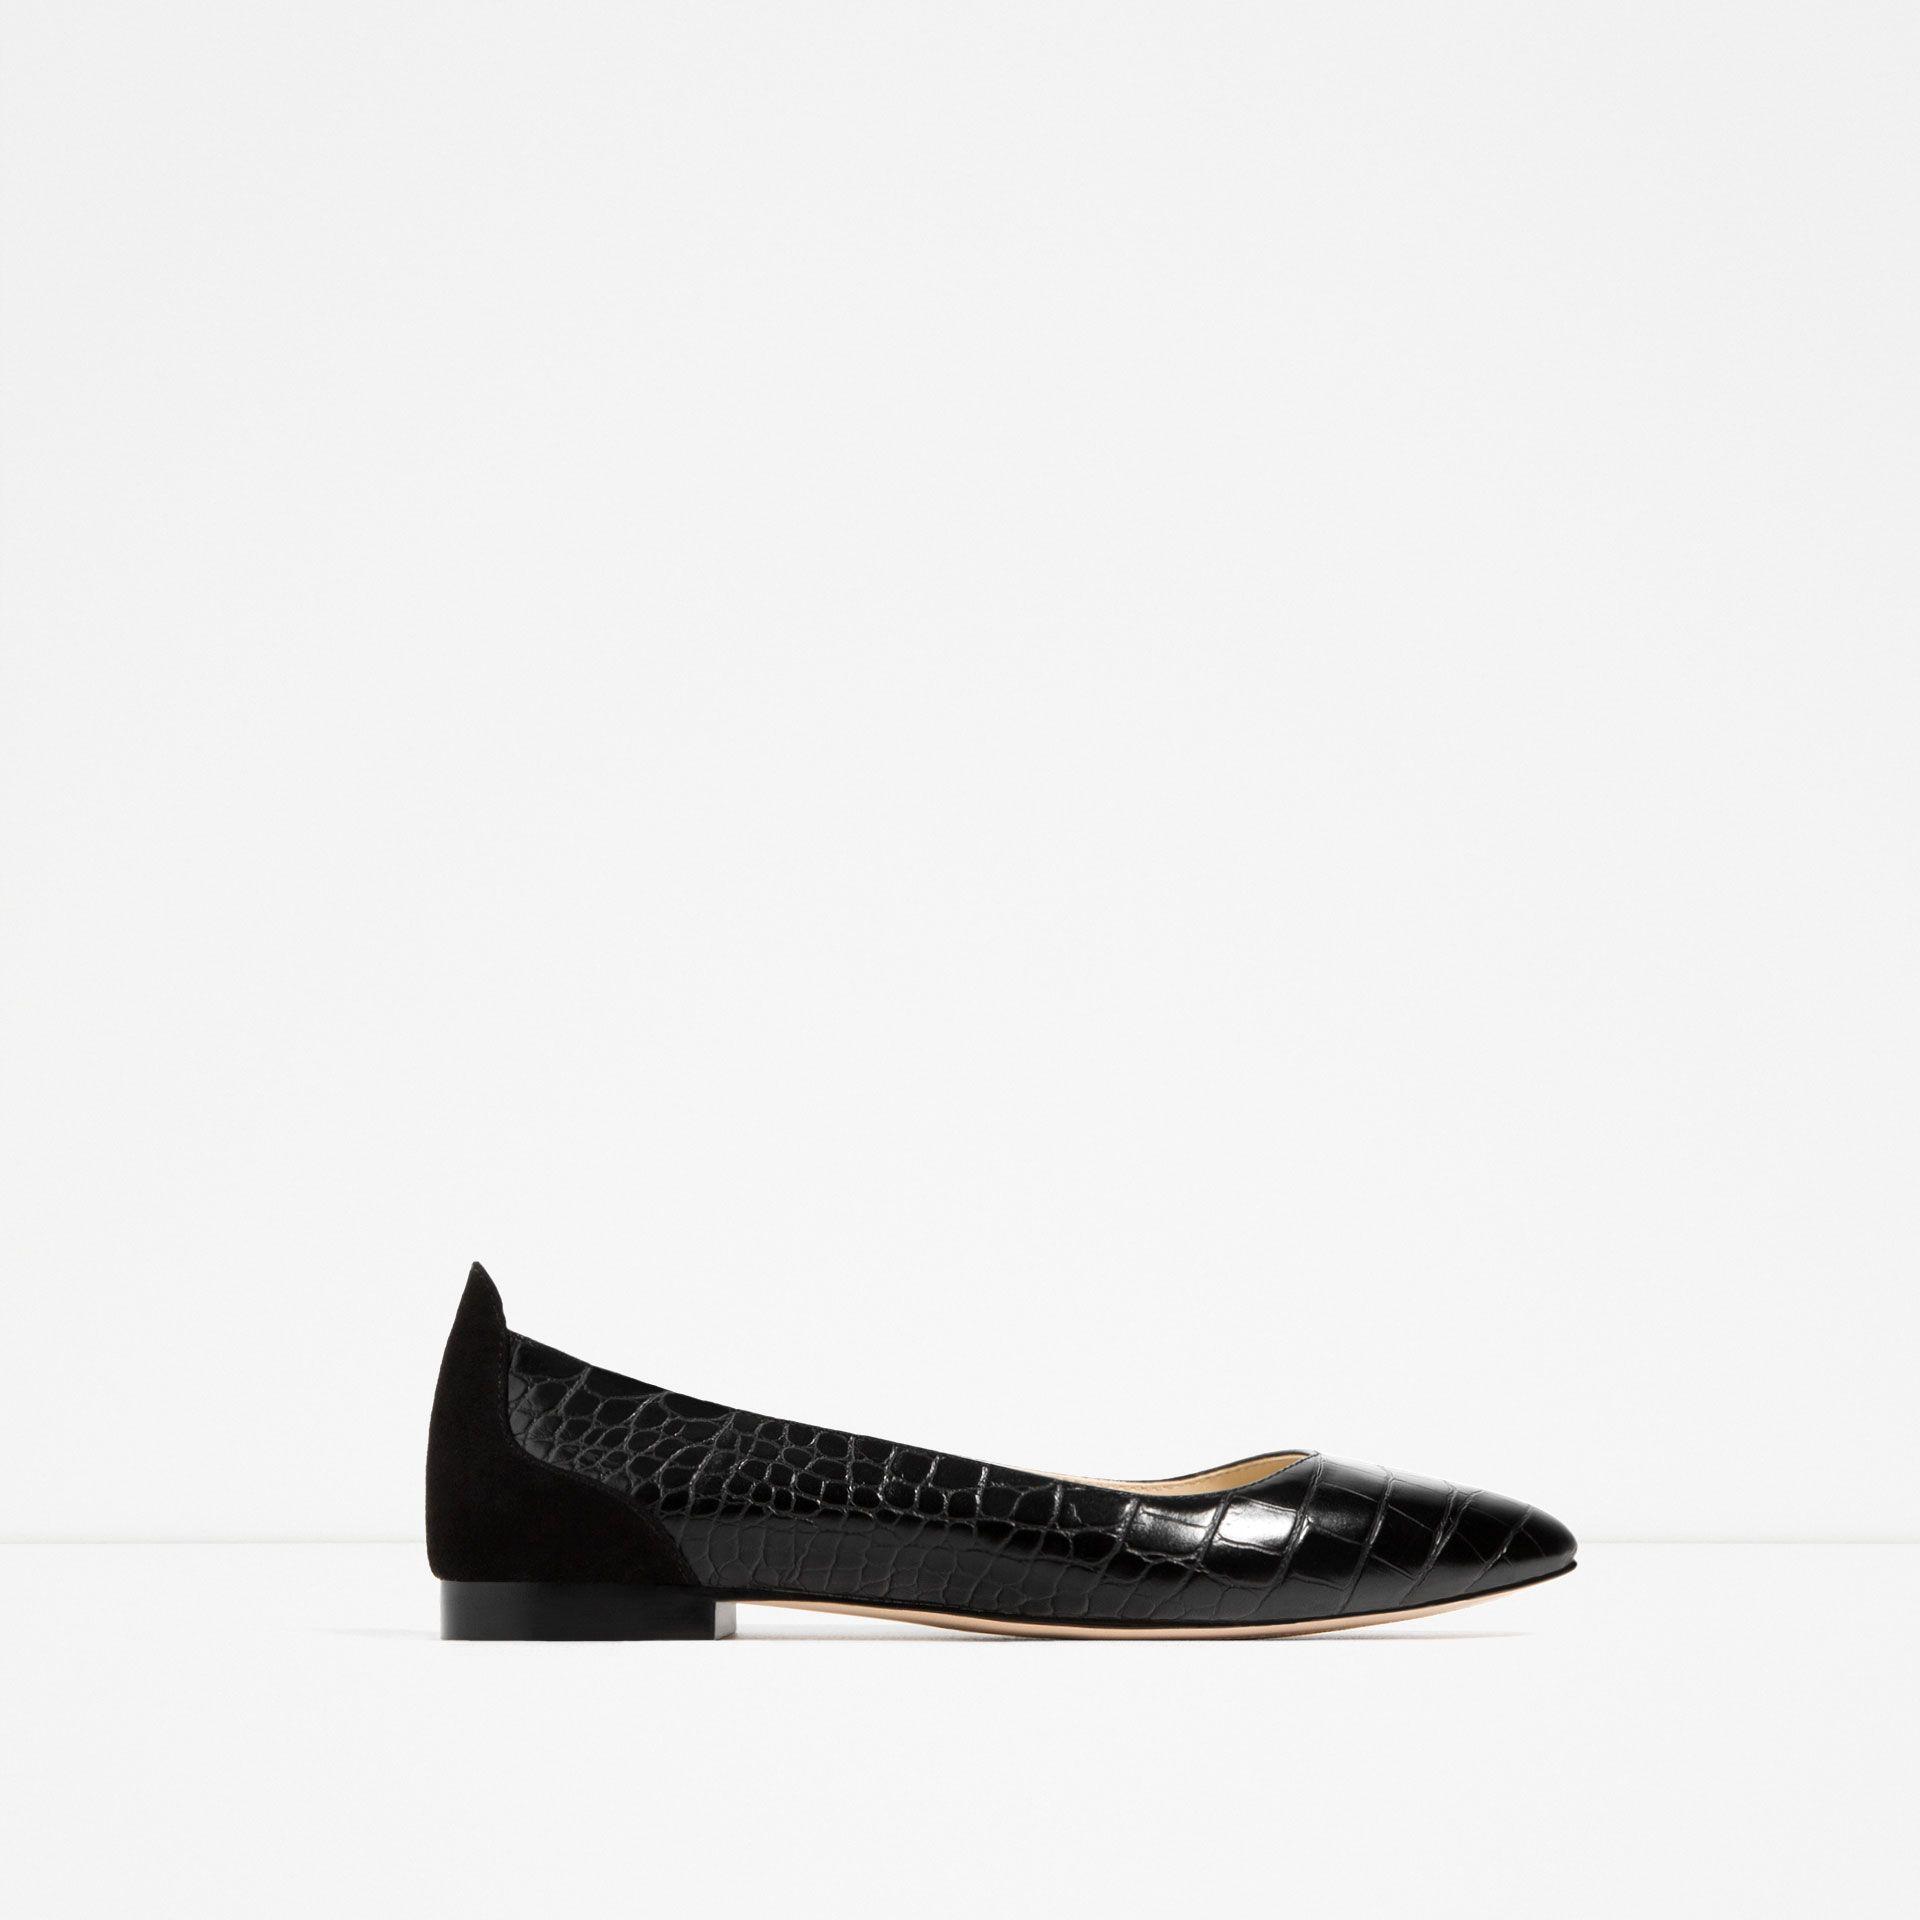 newest a7f2f 623c7 EMBOSSED BALLERINAS | shoes | Zara women, Ballerina shoes, Flats